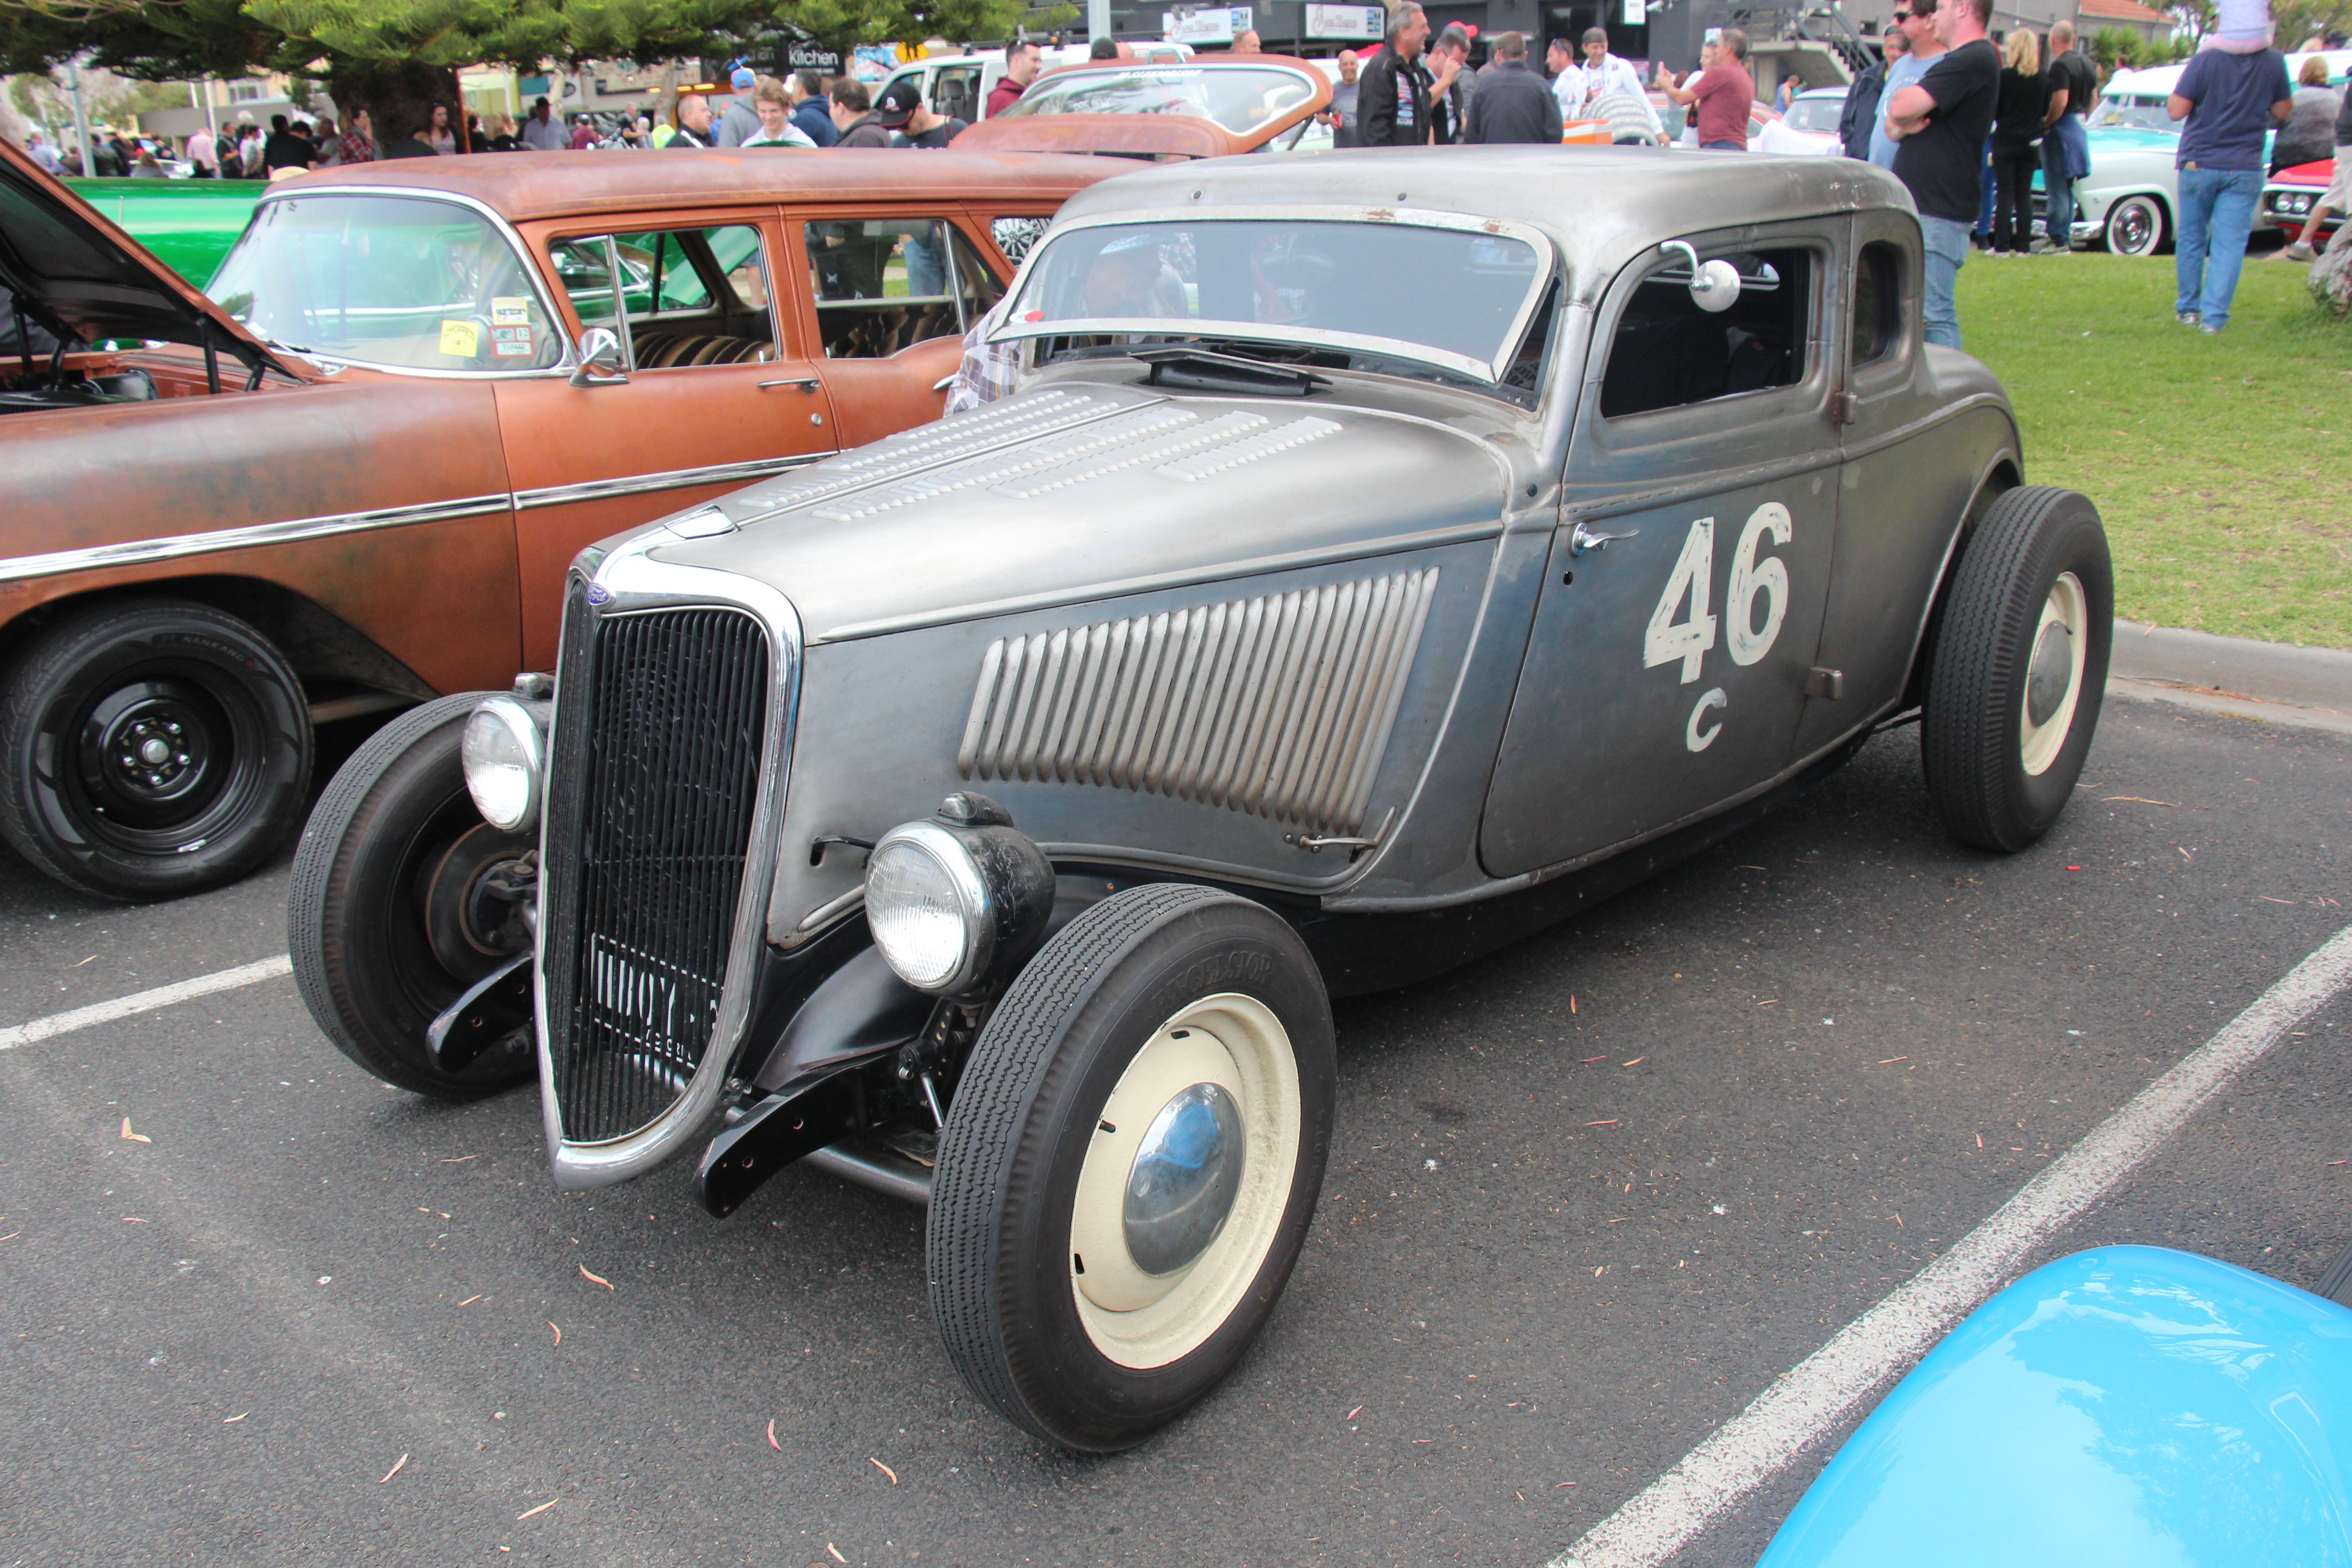 File:1934 Ford 5 window Coupe Hot Rod (24112245750).jpg - Wikimedia ...